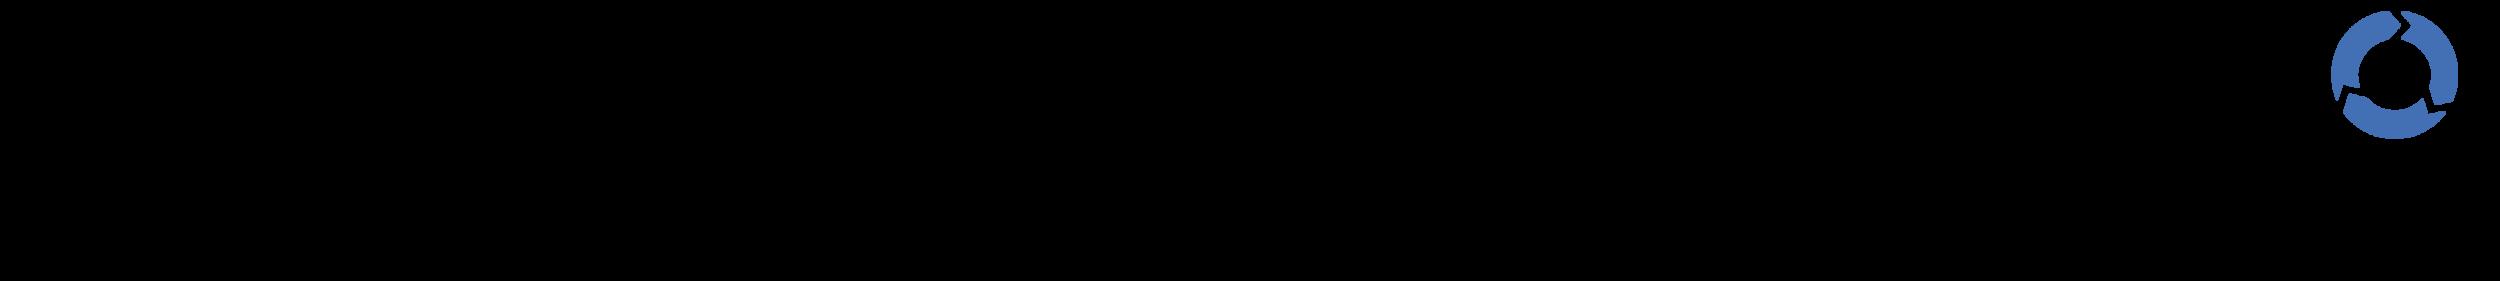 Logo_Emt_Classic_blue_circ_large.png